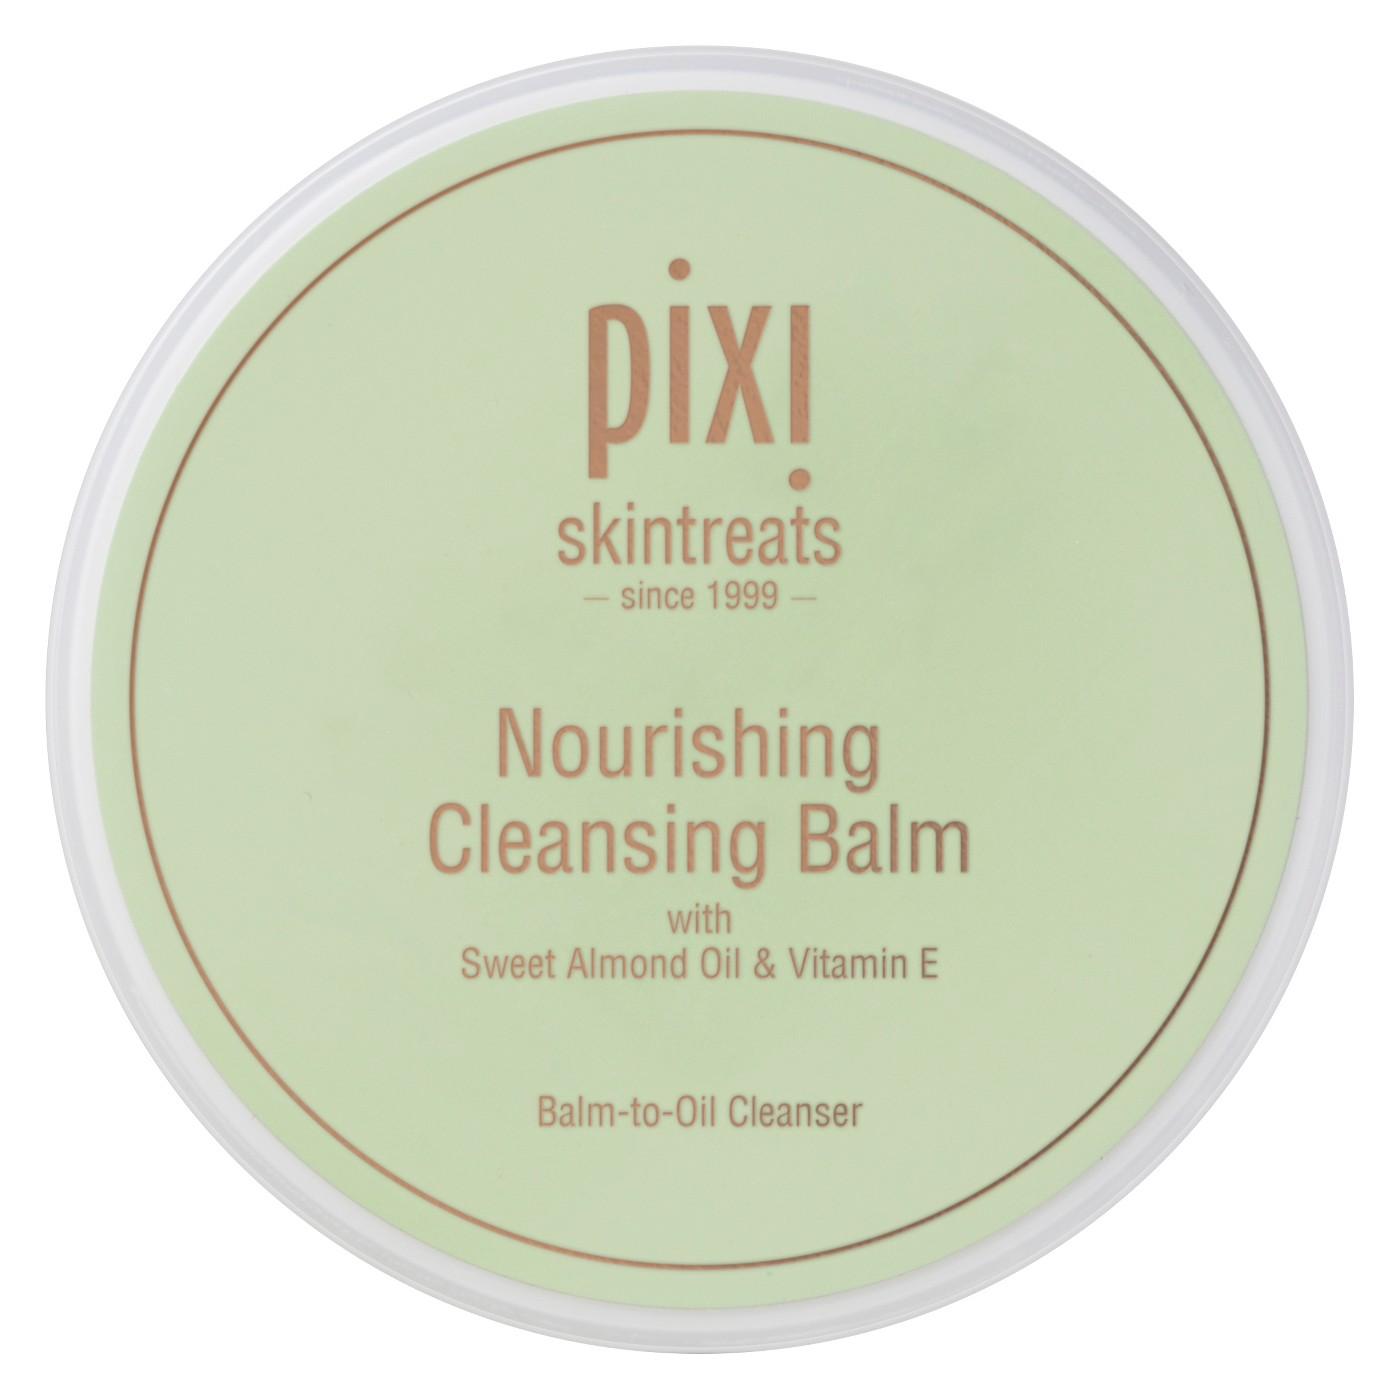 pixi-skintreats-nourishing-cleasnig-balm